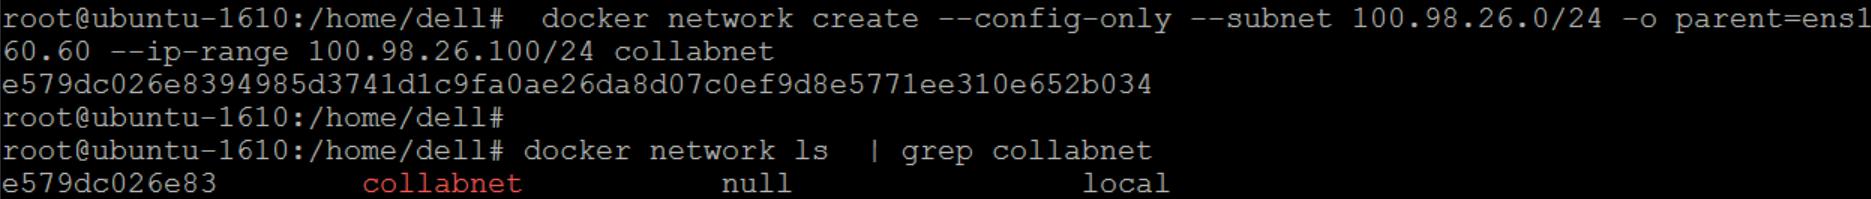 docker network create plugin not found